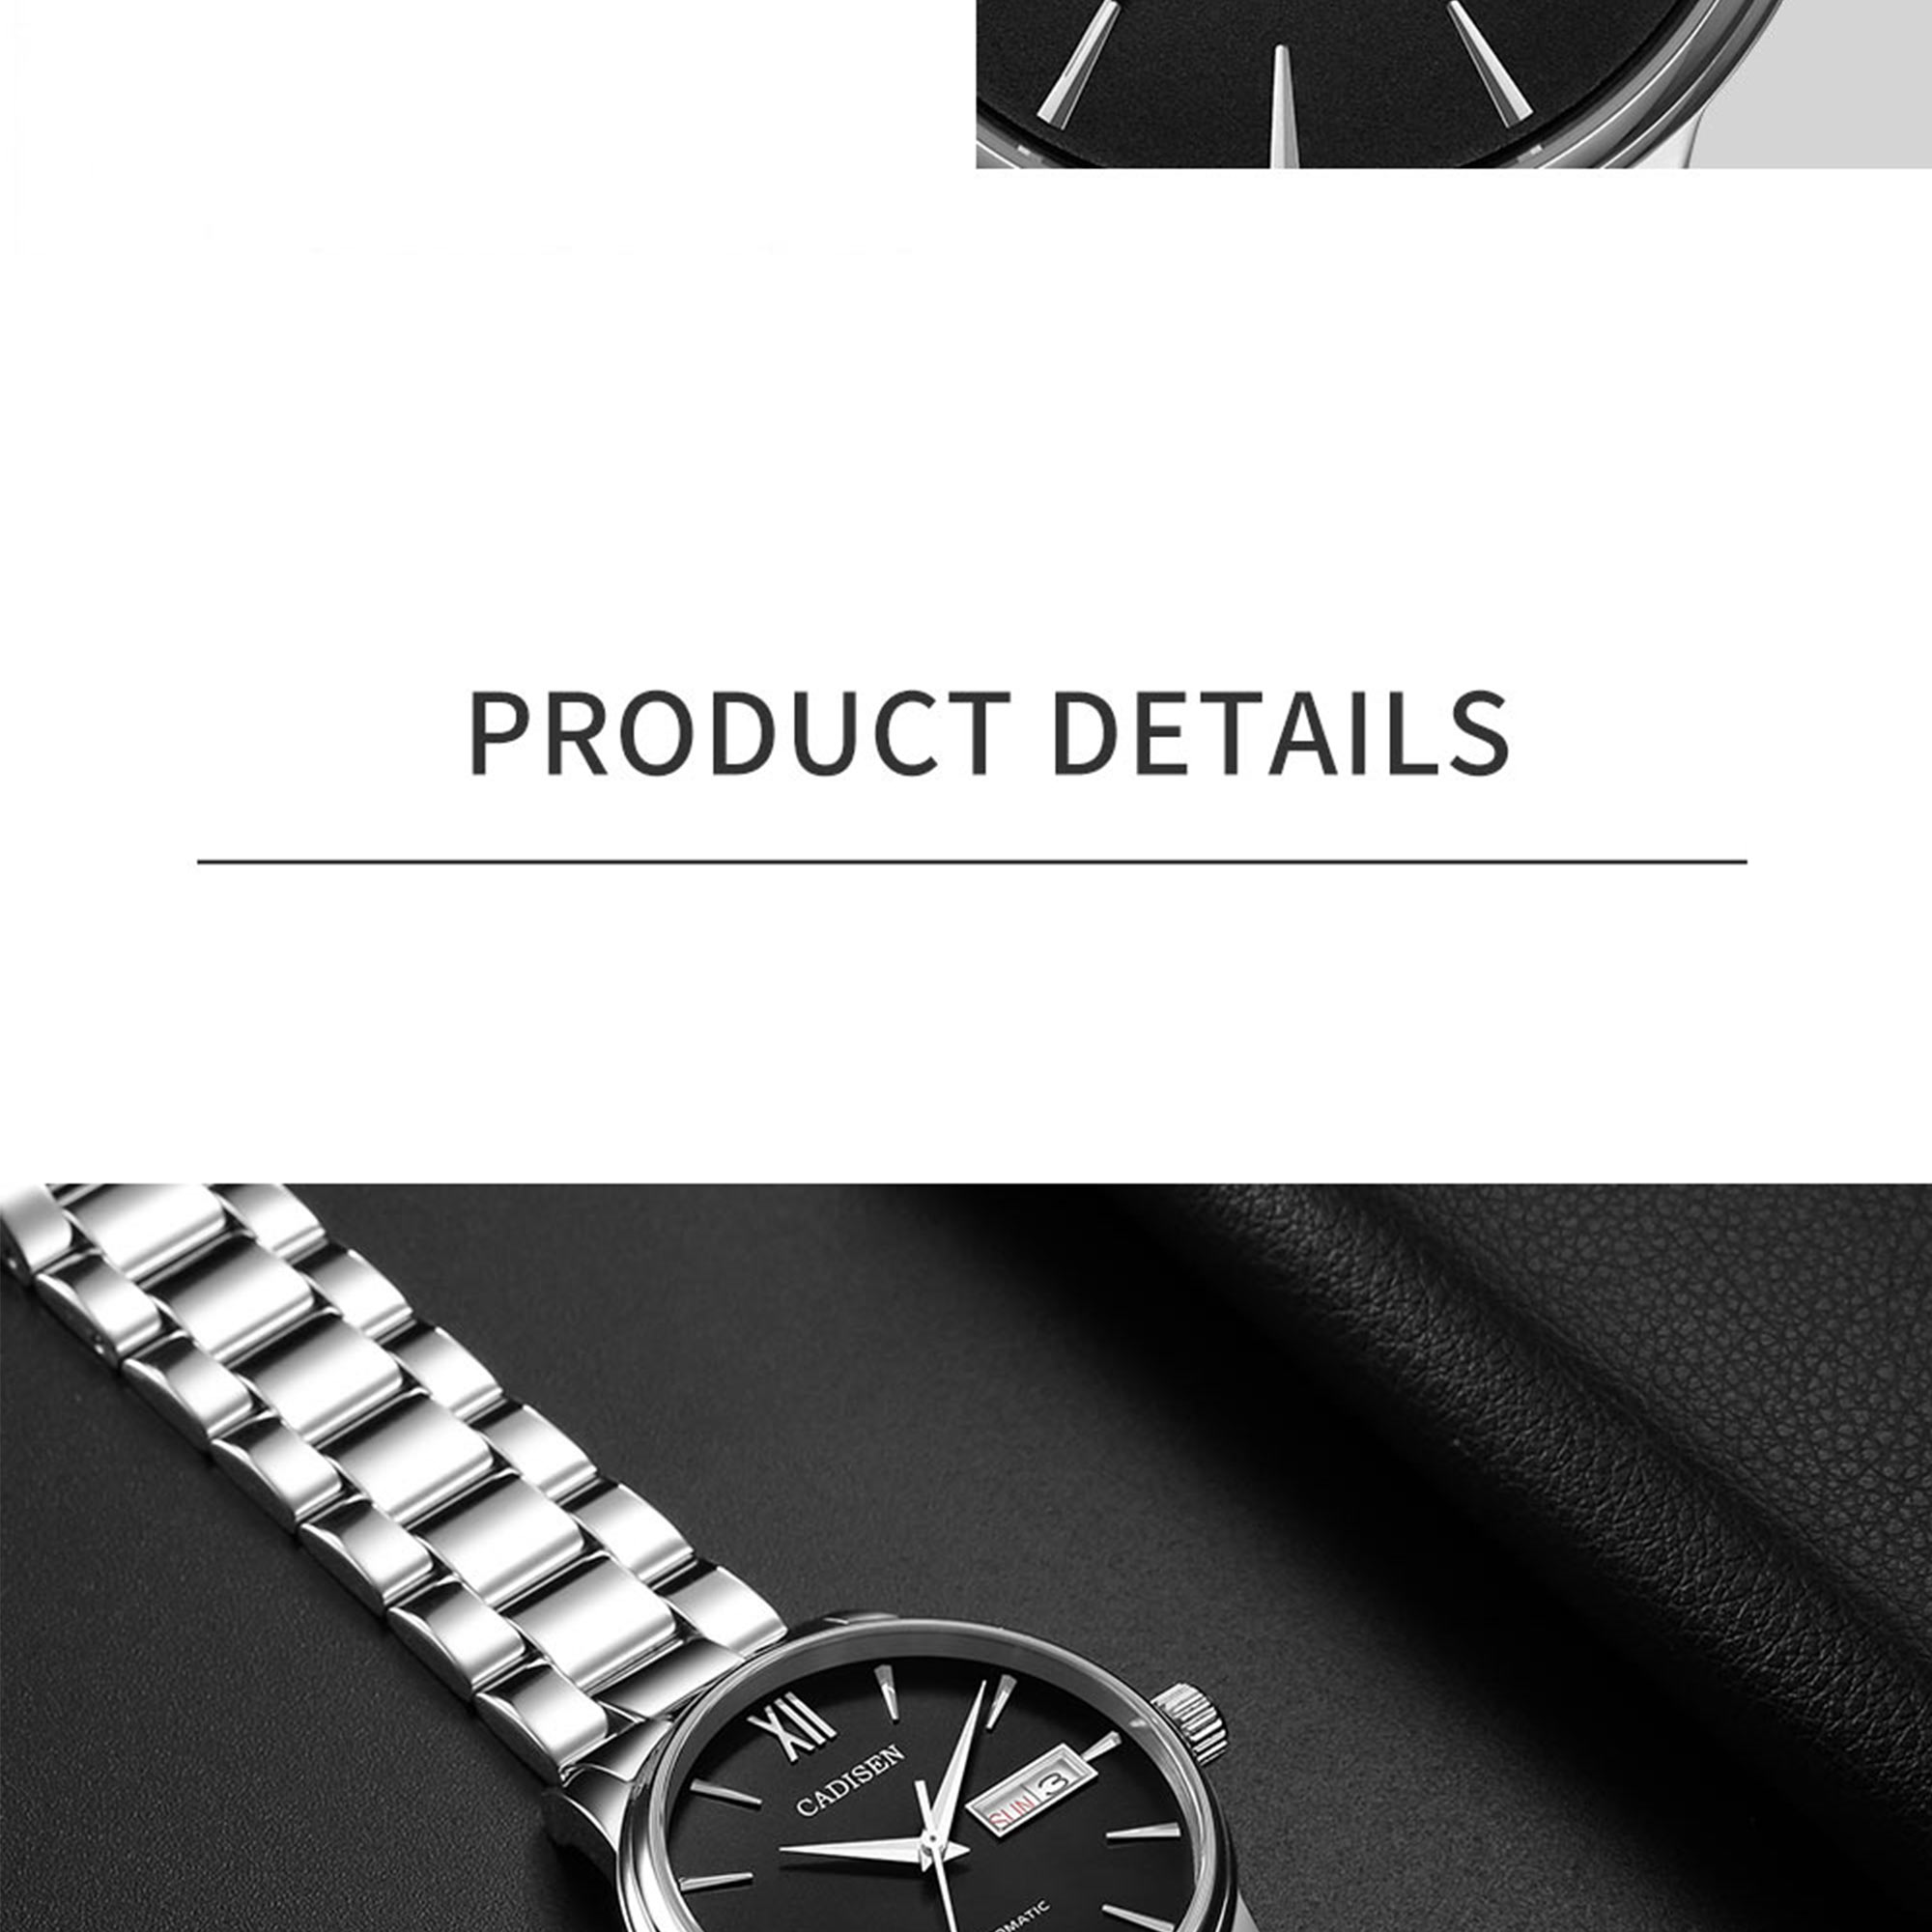 H41a321f2f90f4e588f99e5e91ff17e7er CADISEN Men Watch Automatic Mechanical Watches Role Date Week Top Luxury Brand Japan NH36A Wrist watch Clock Relogio Masculino